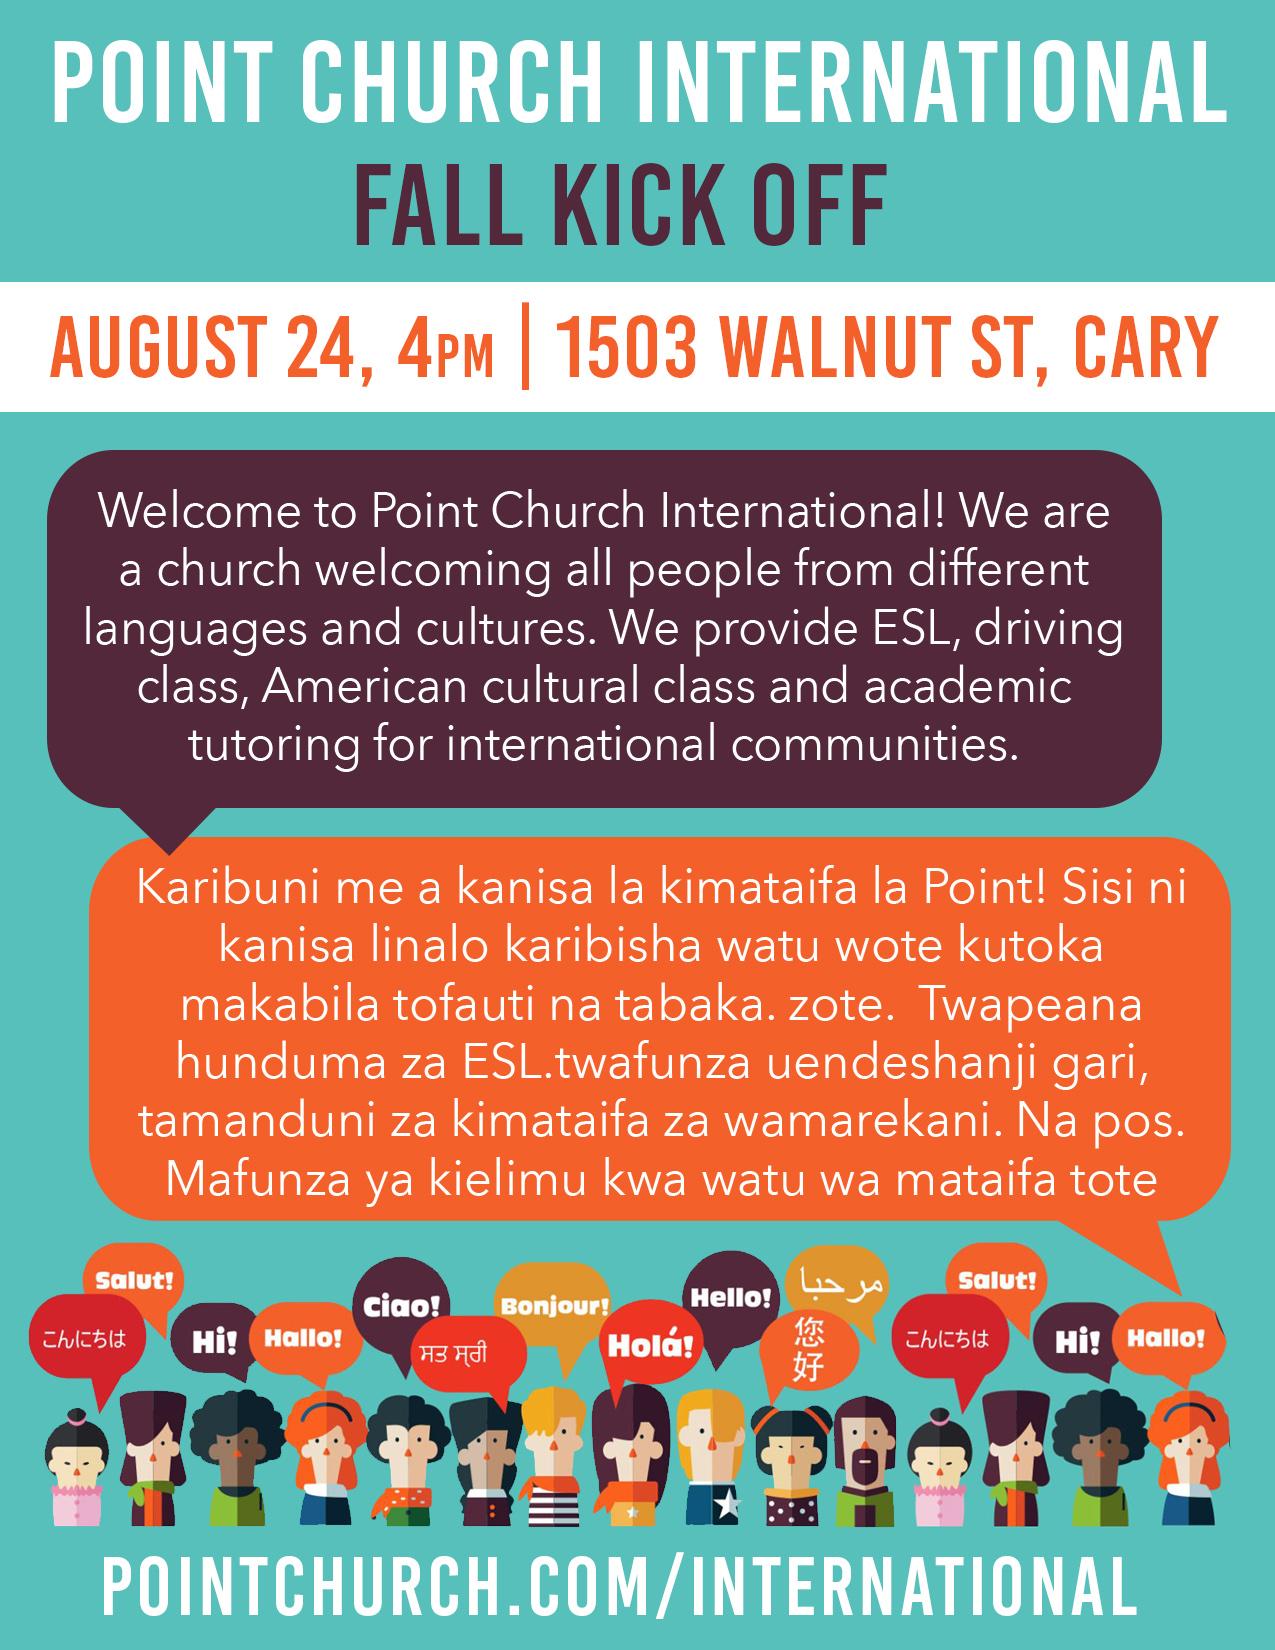 International Fall kick-off